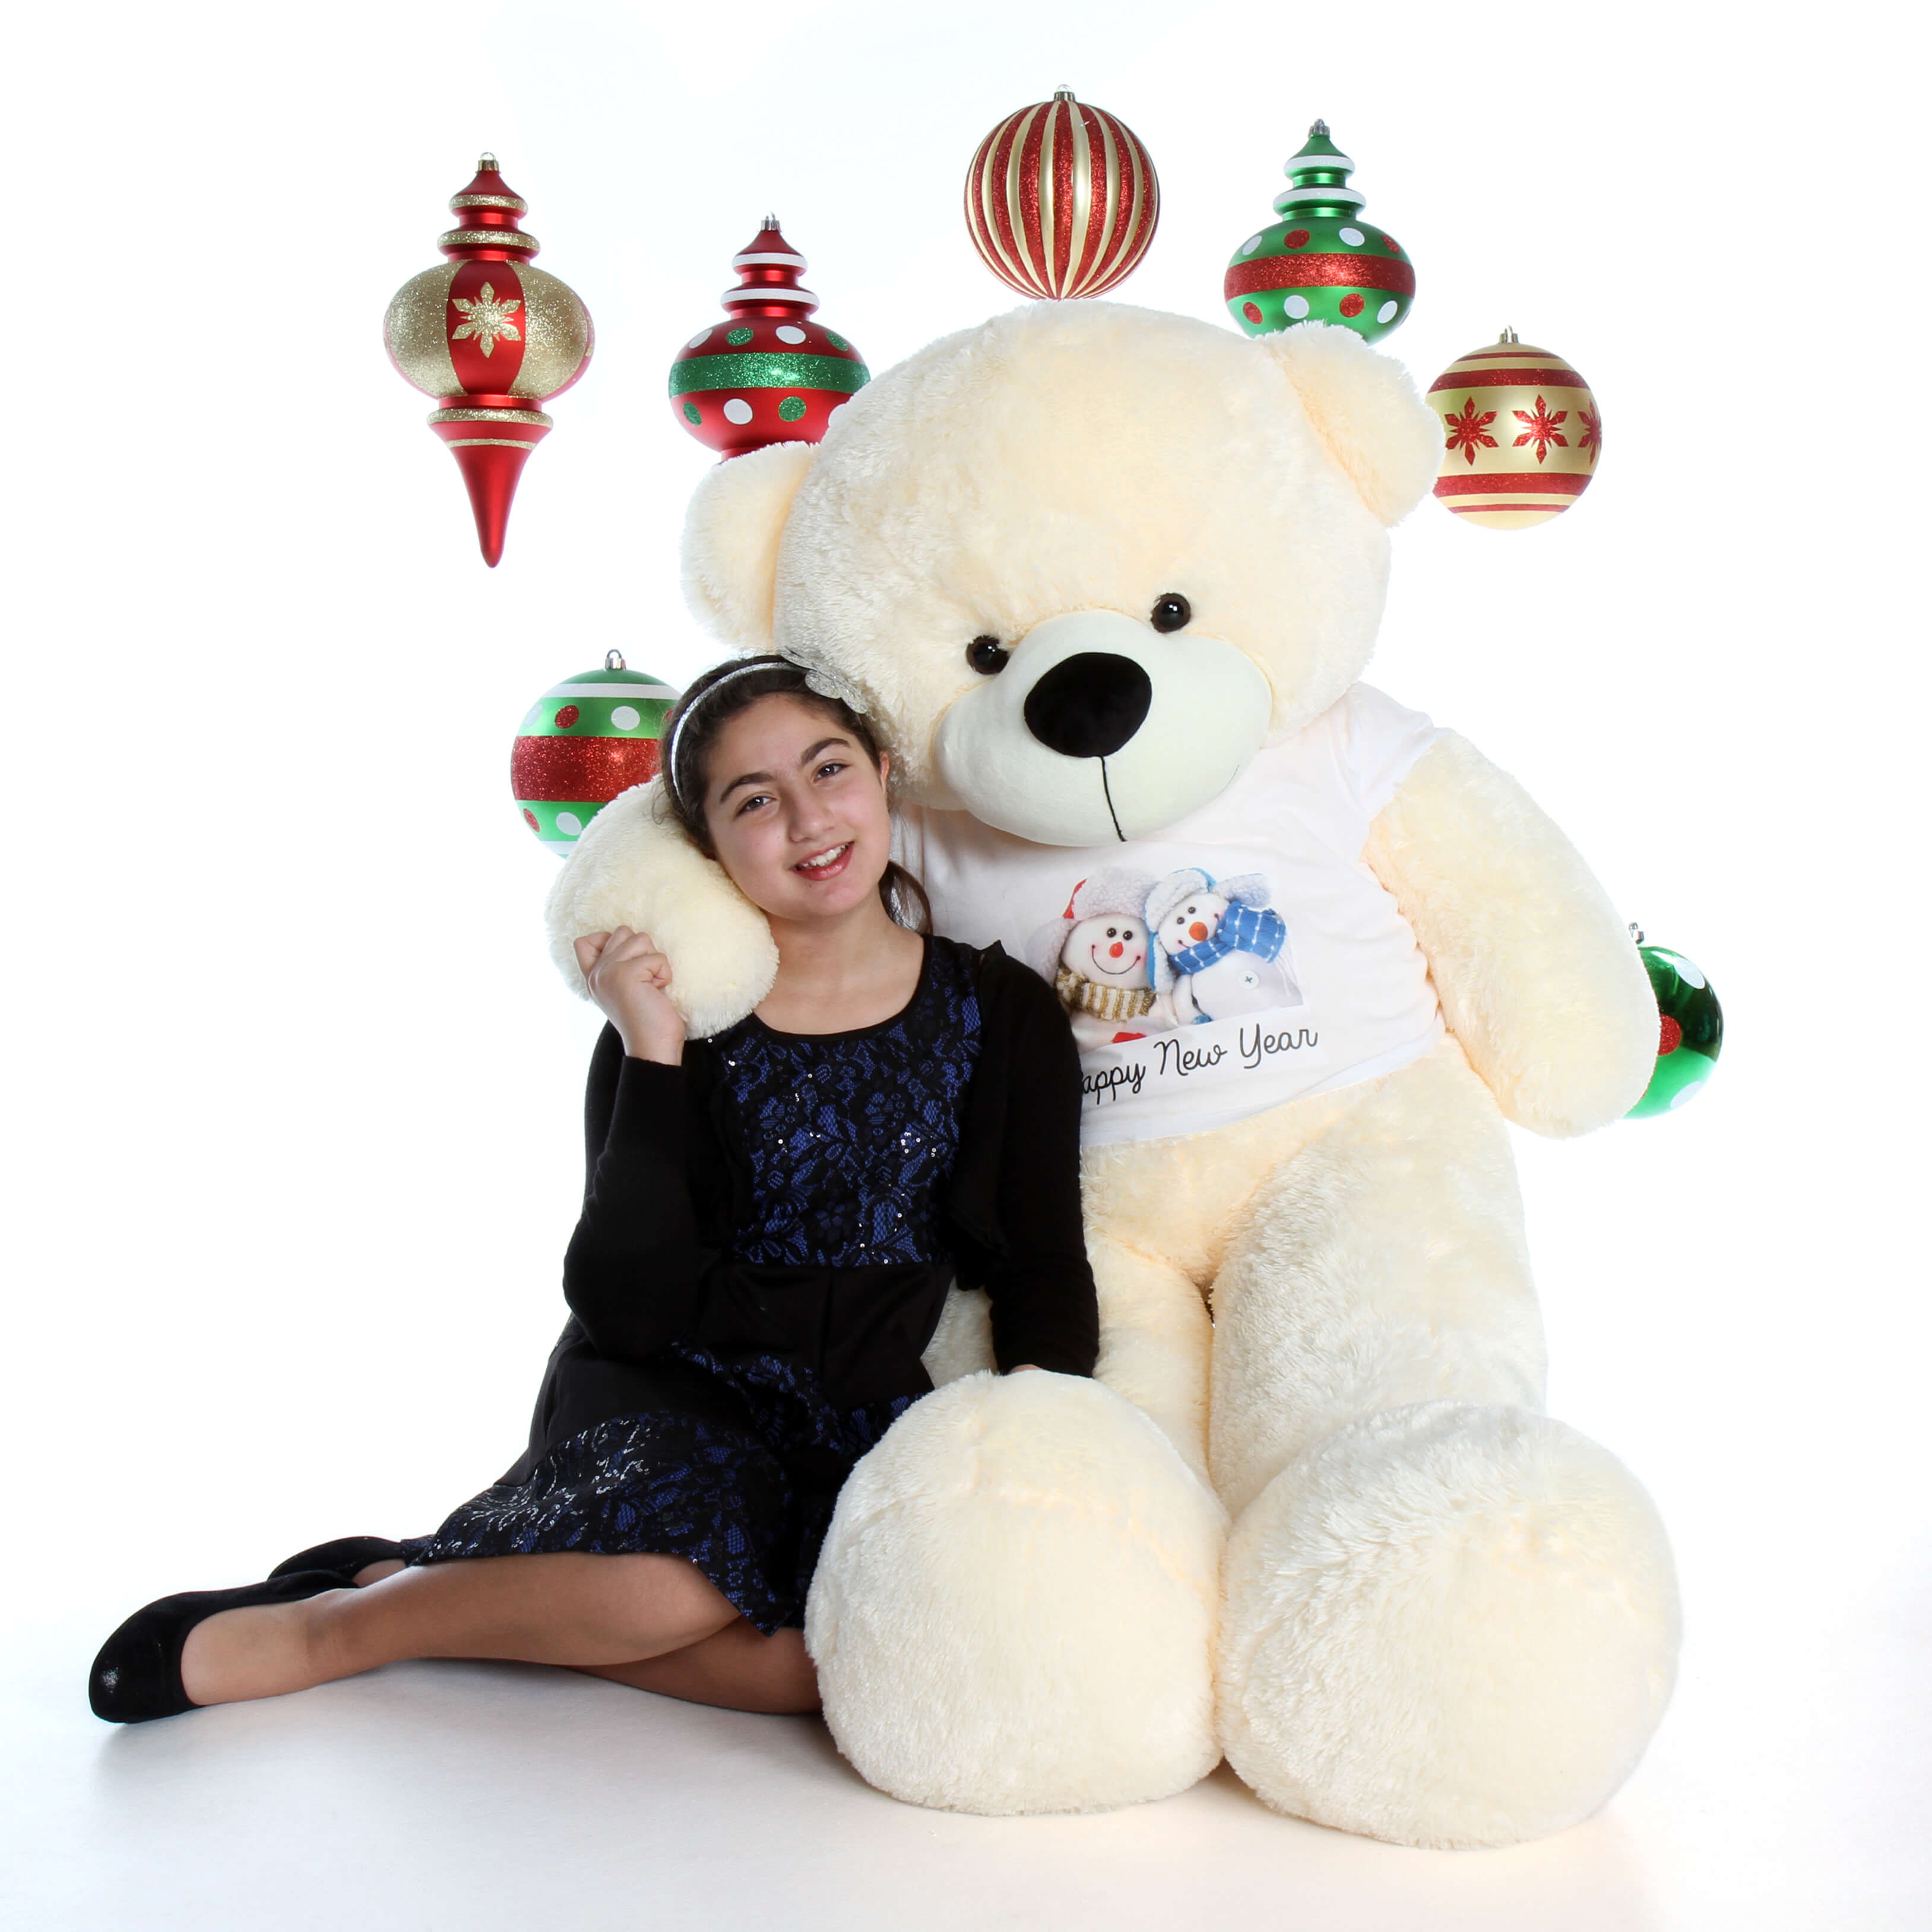 5ft-cozy-cuddles-happy-new-year-giant-vanilla-cream-teddy-bear1.jpg